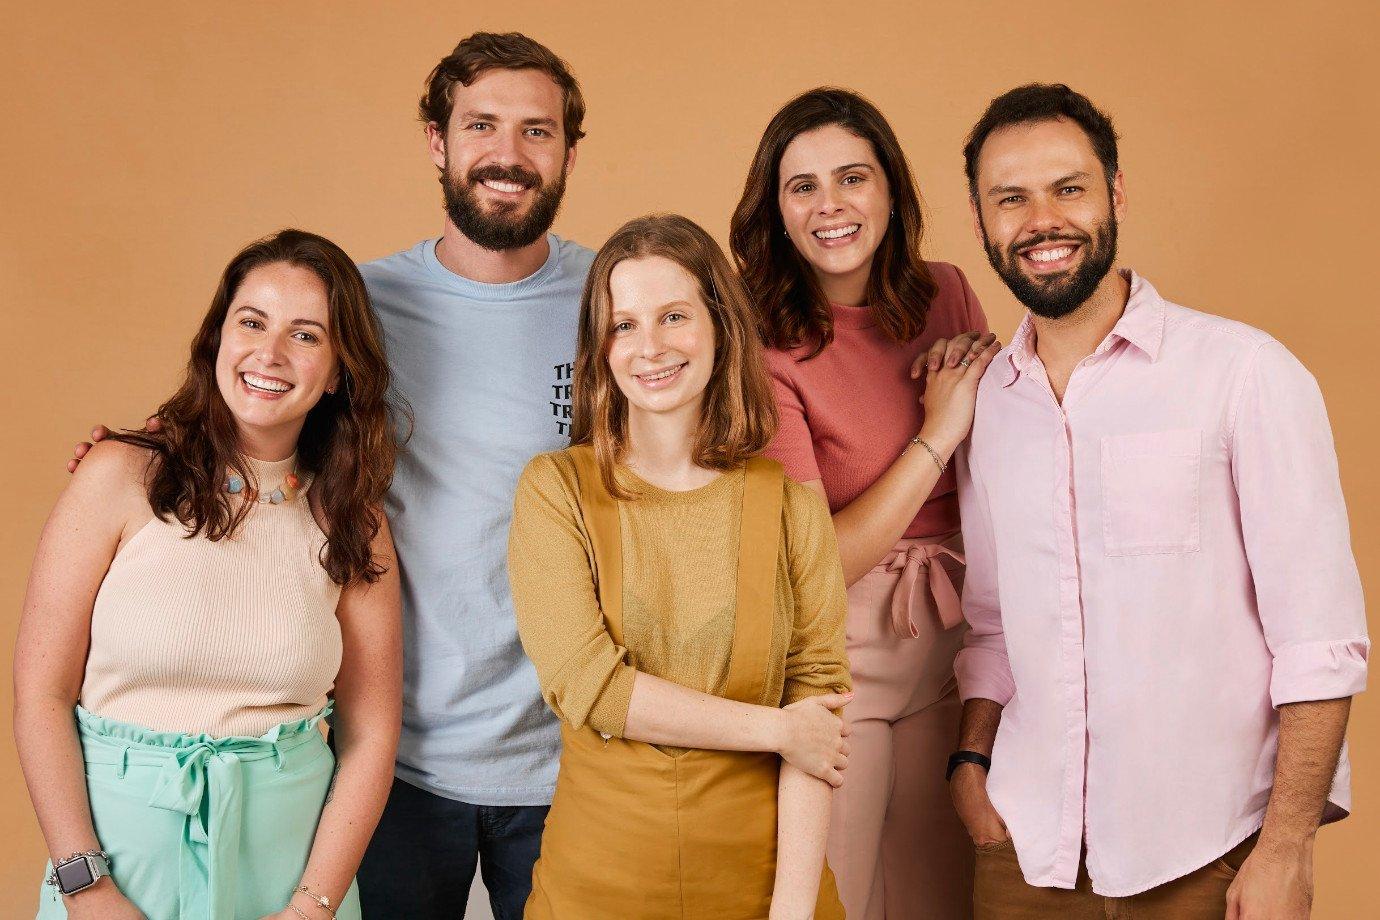 Andrea Nazar, Michael Ruah, Onella Moraes, Natalia Lombardo e Alexandre Gama, da SouSmile